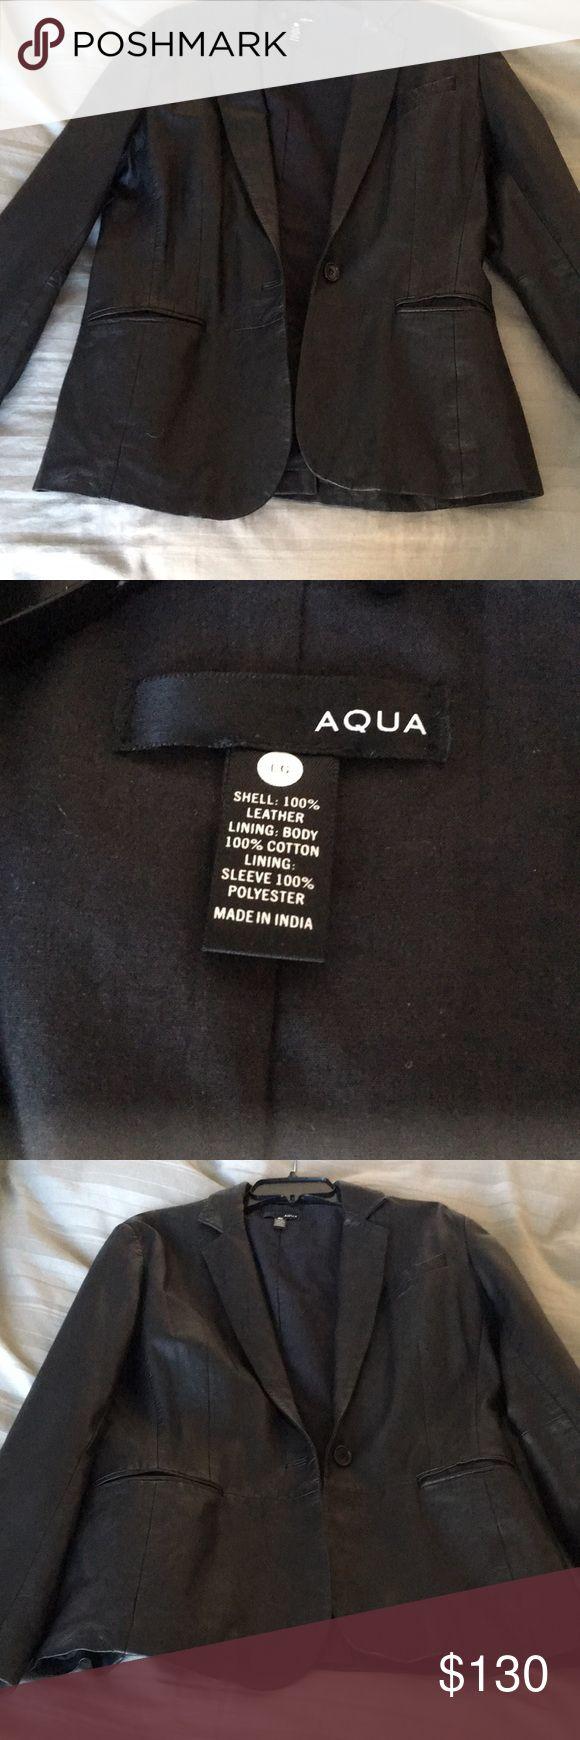 Bloomingdales Aqua Brand leather blazer- Black leather blazer new without tags- Bloomingdales Aqua brand size L Jackets & Coats Blazers